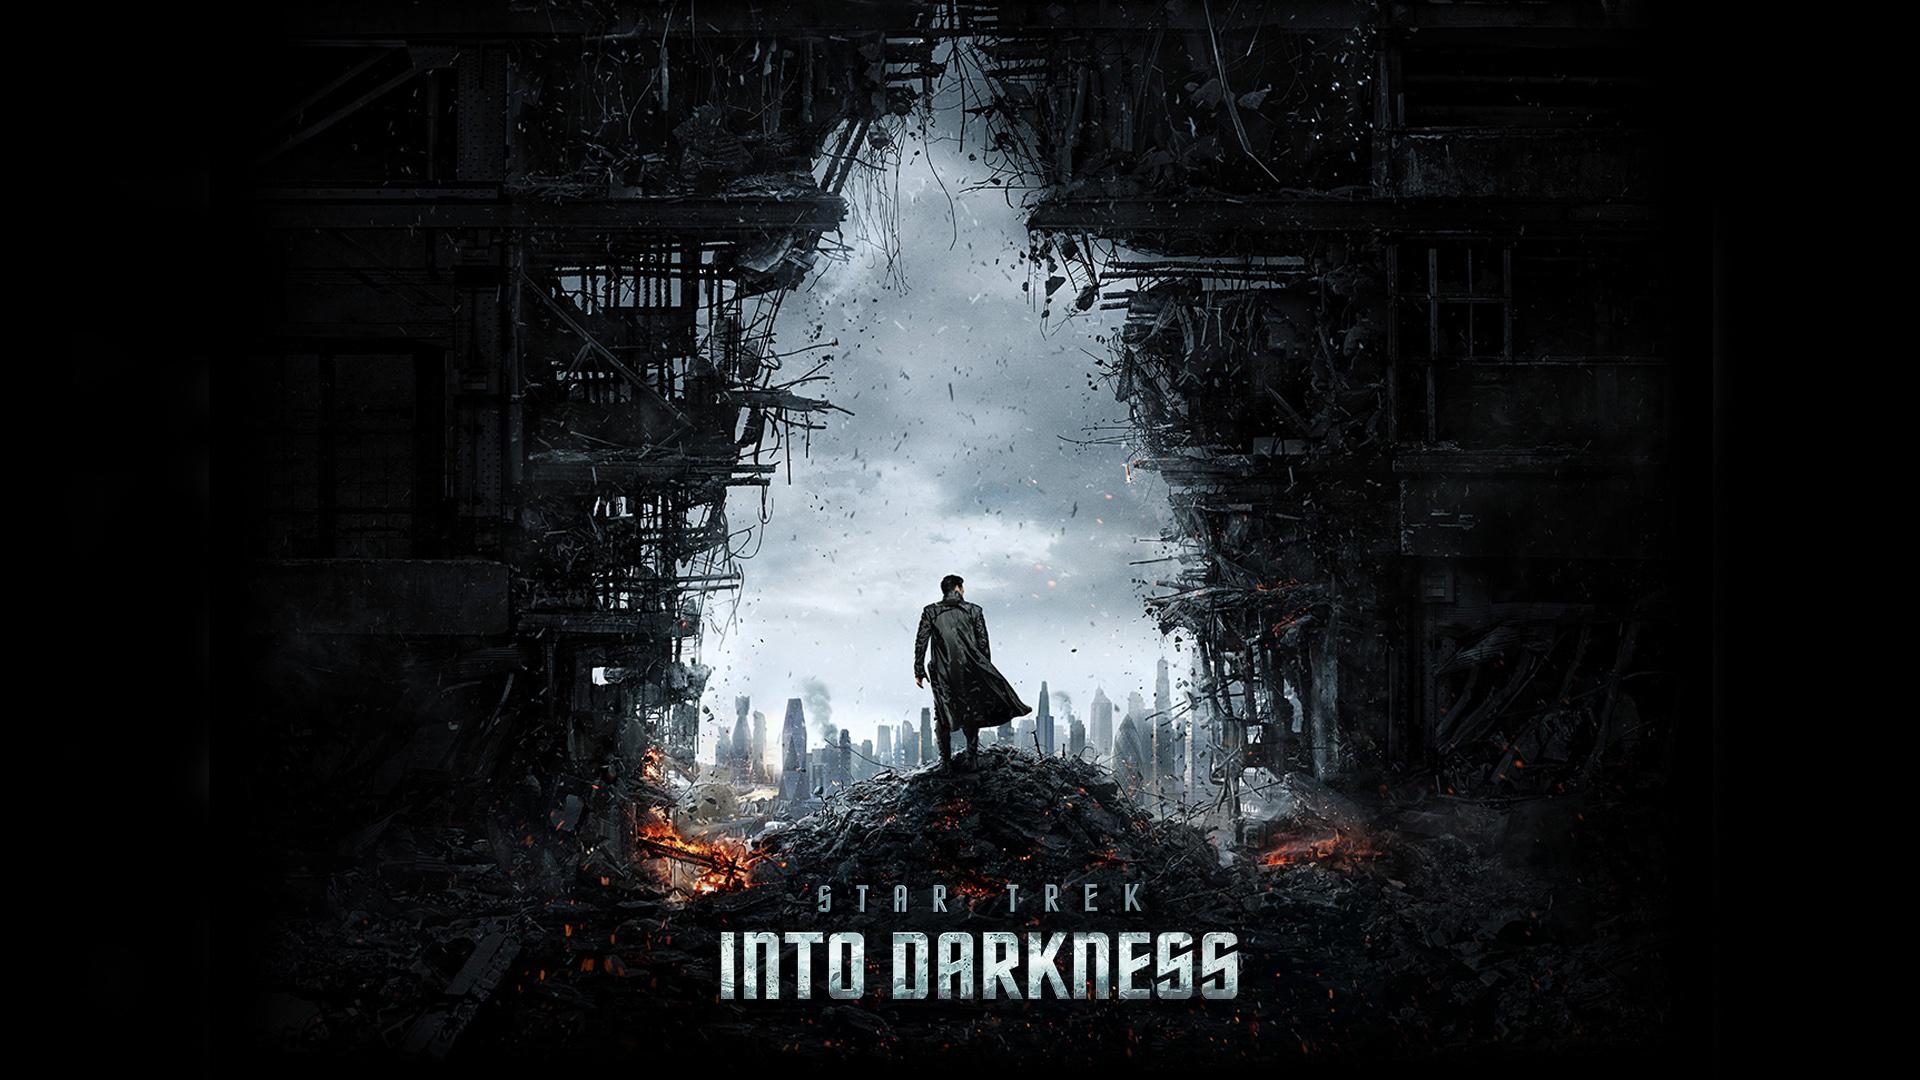 Benedict Cumberbatch as John Harrison in Star Trek Into Darkness poster